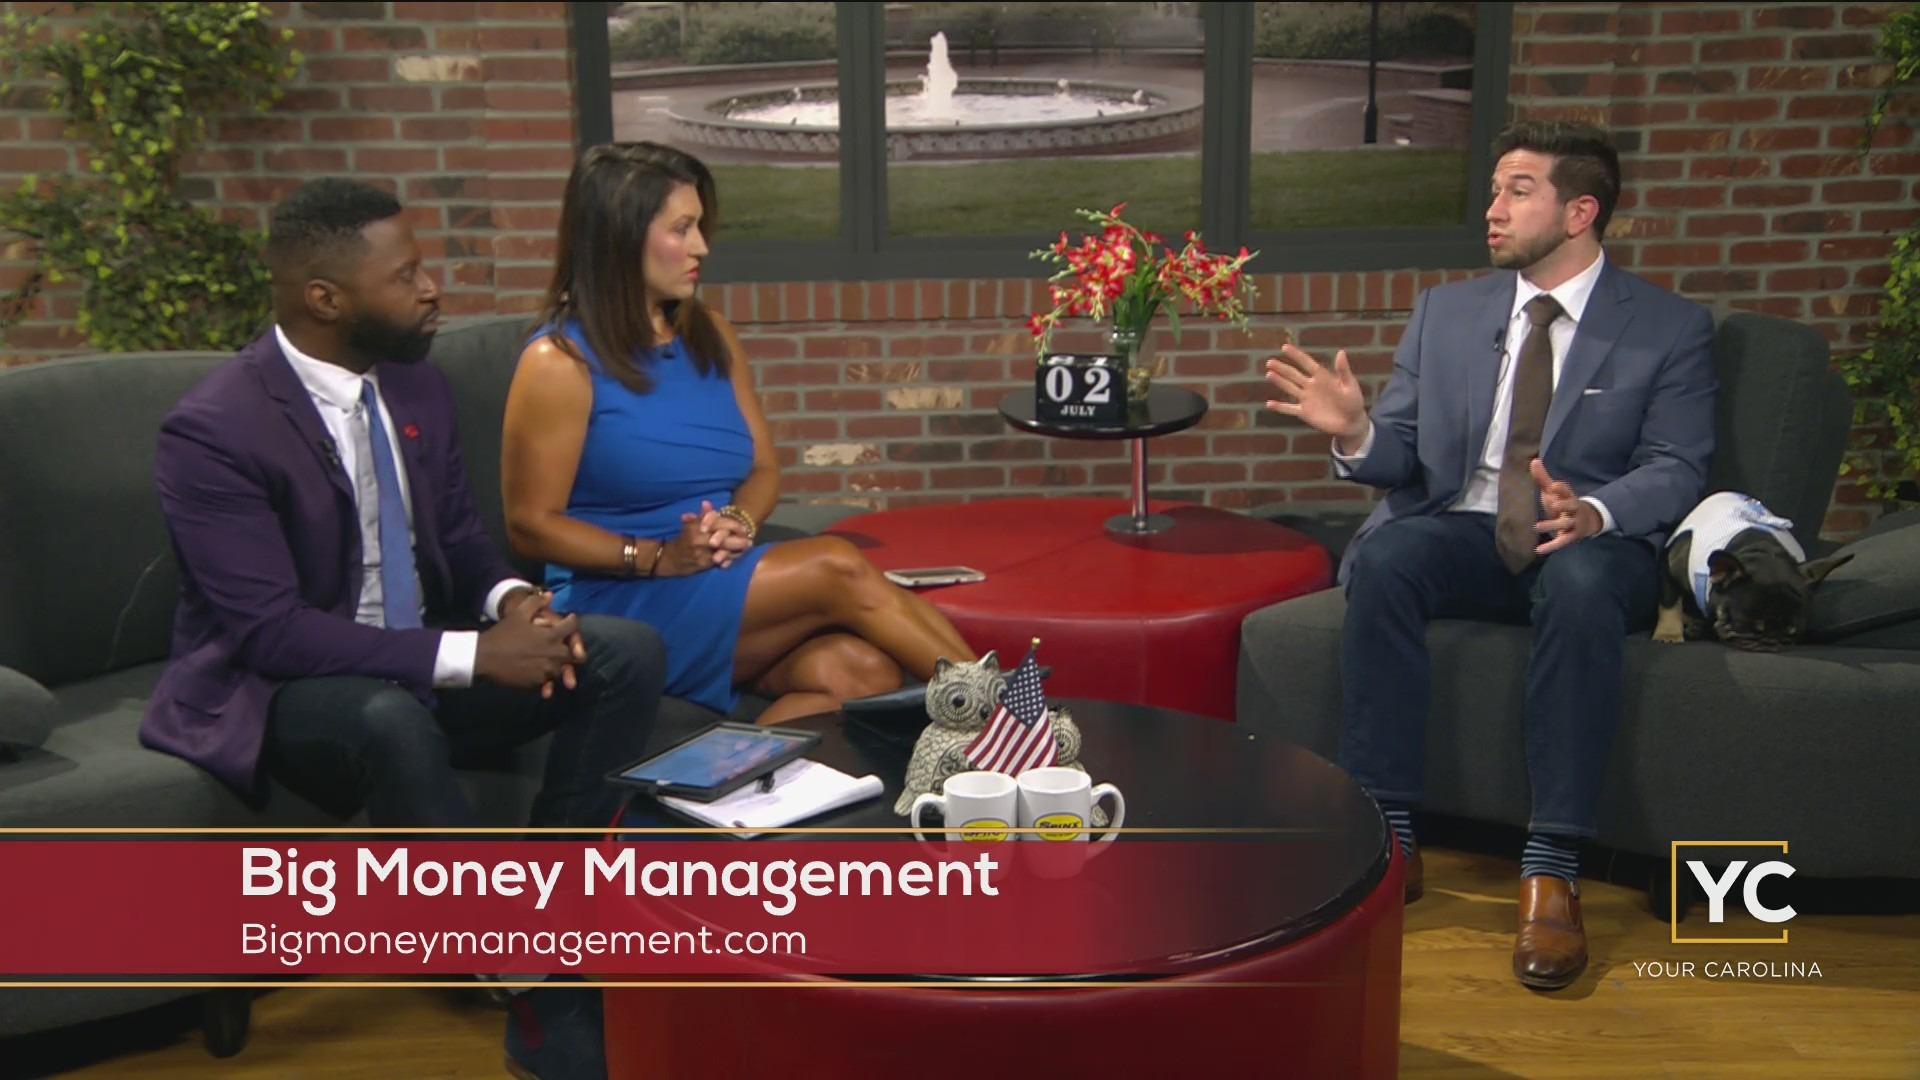 Big Money Management - Getting Your Finances on Track